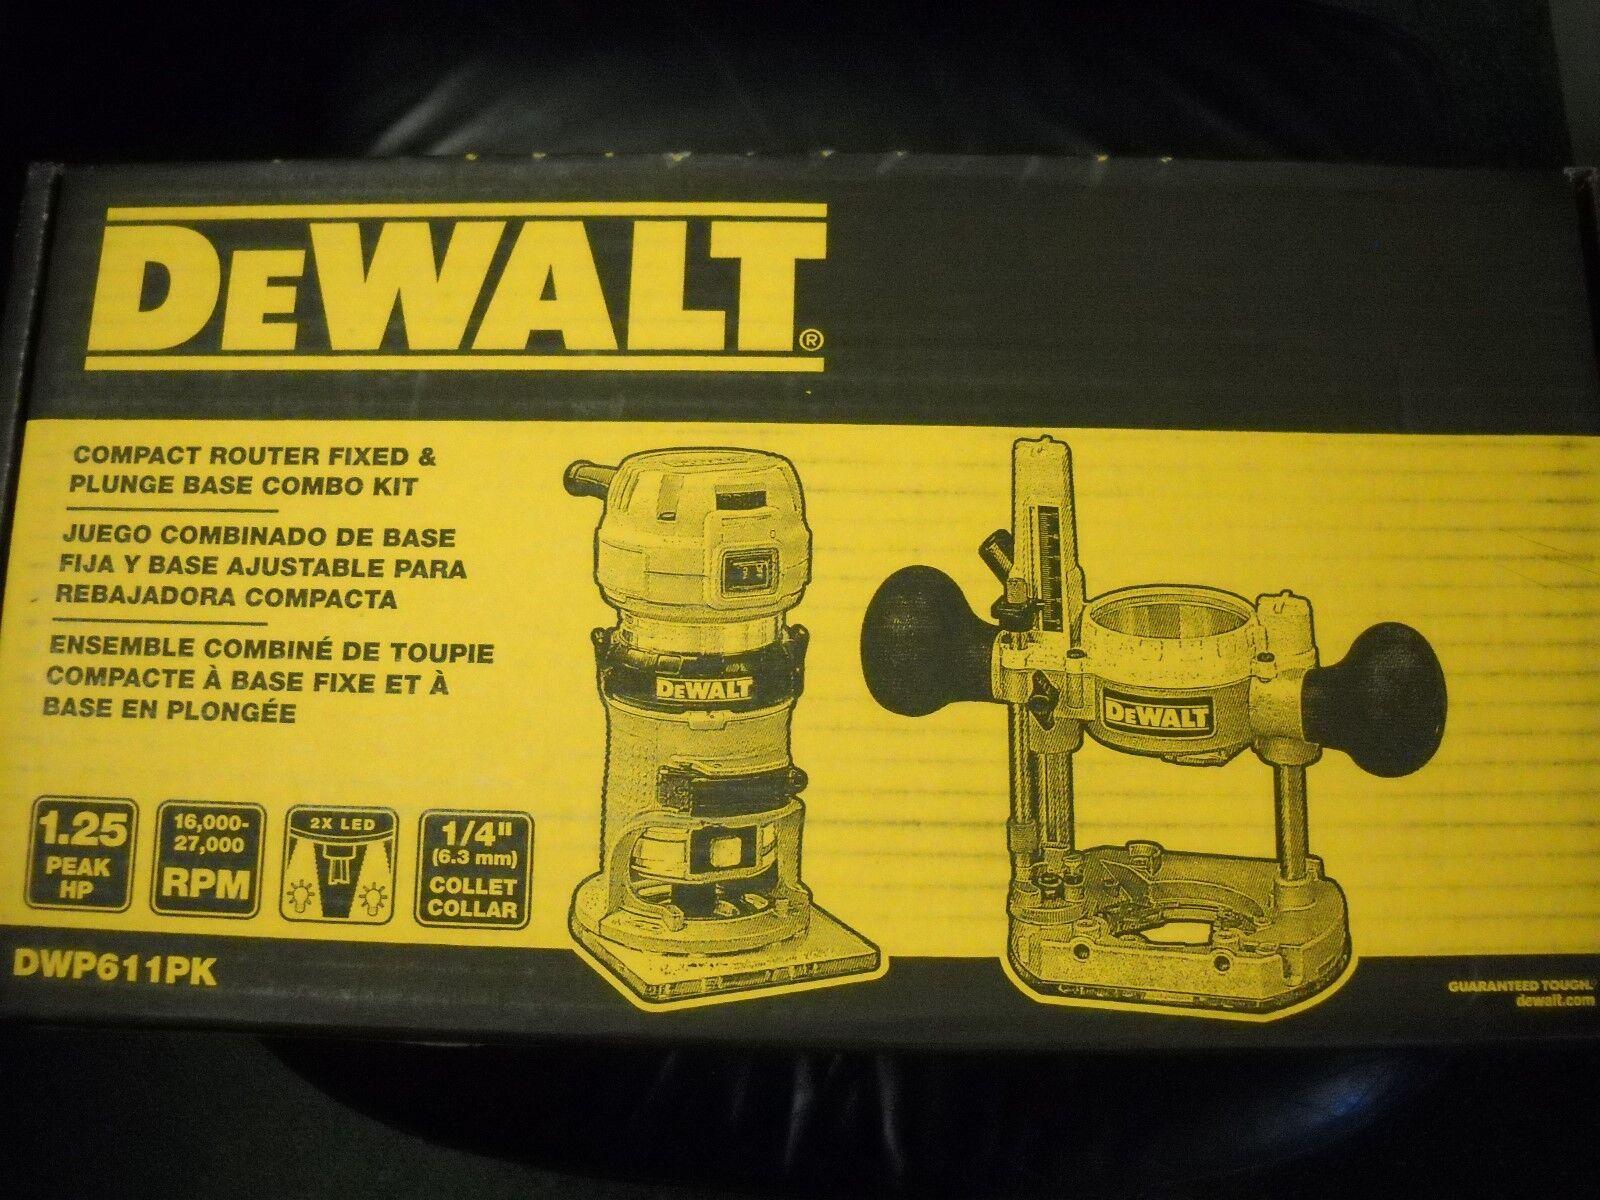 DEWALT DWP611PK 120V Premium Compact 1-1/4 HP Router Fixed/Plunge Combo Kit New